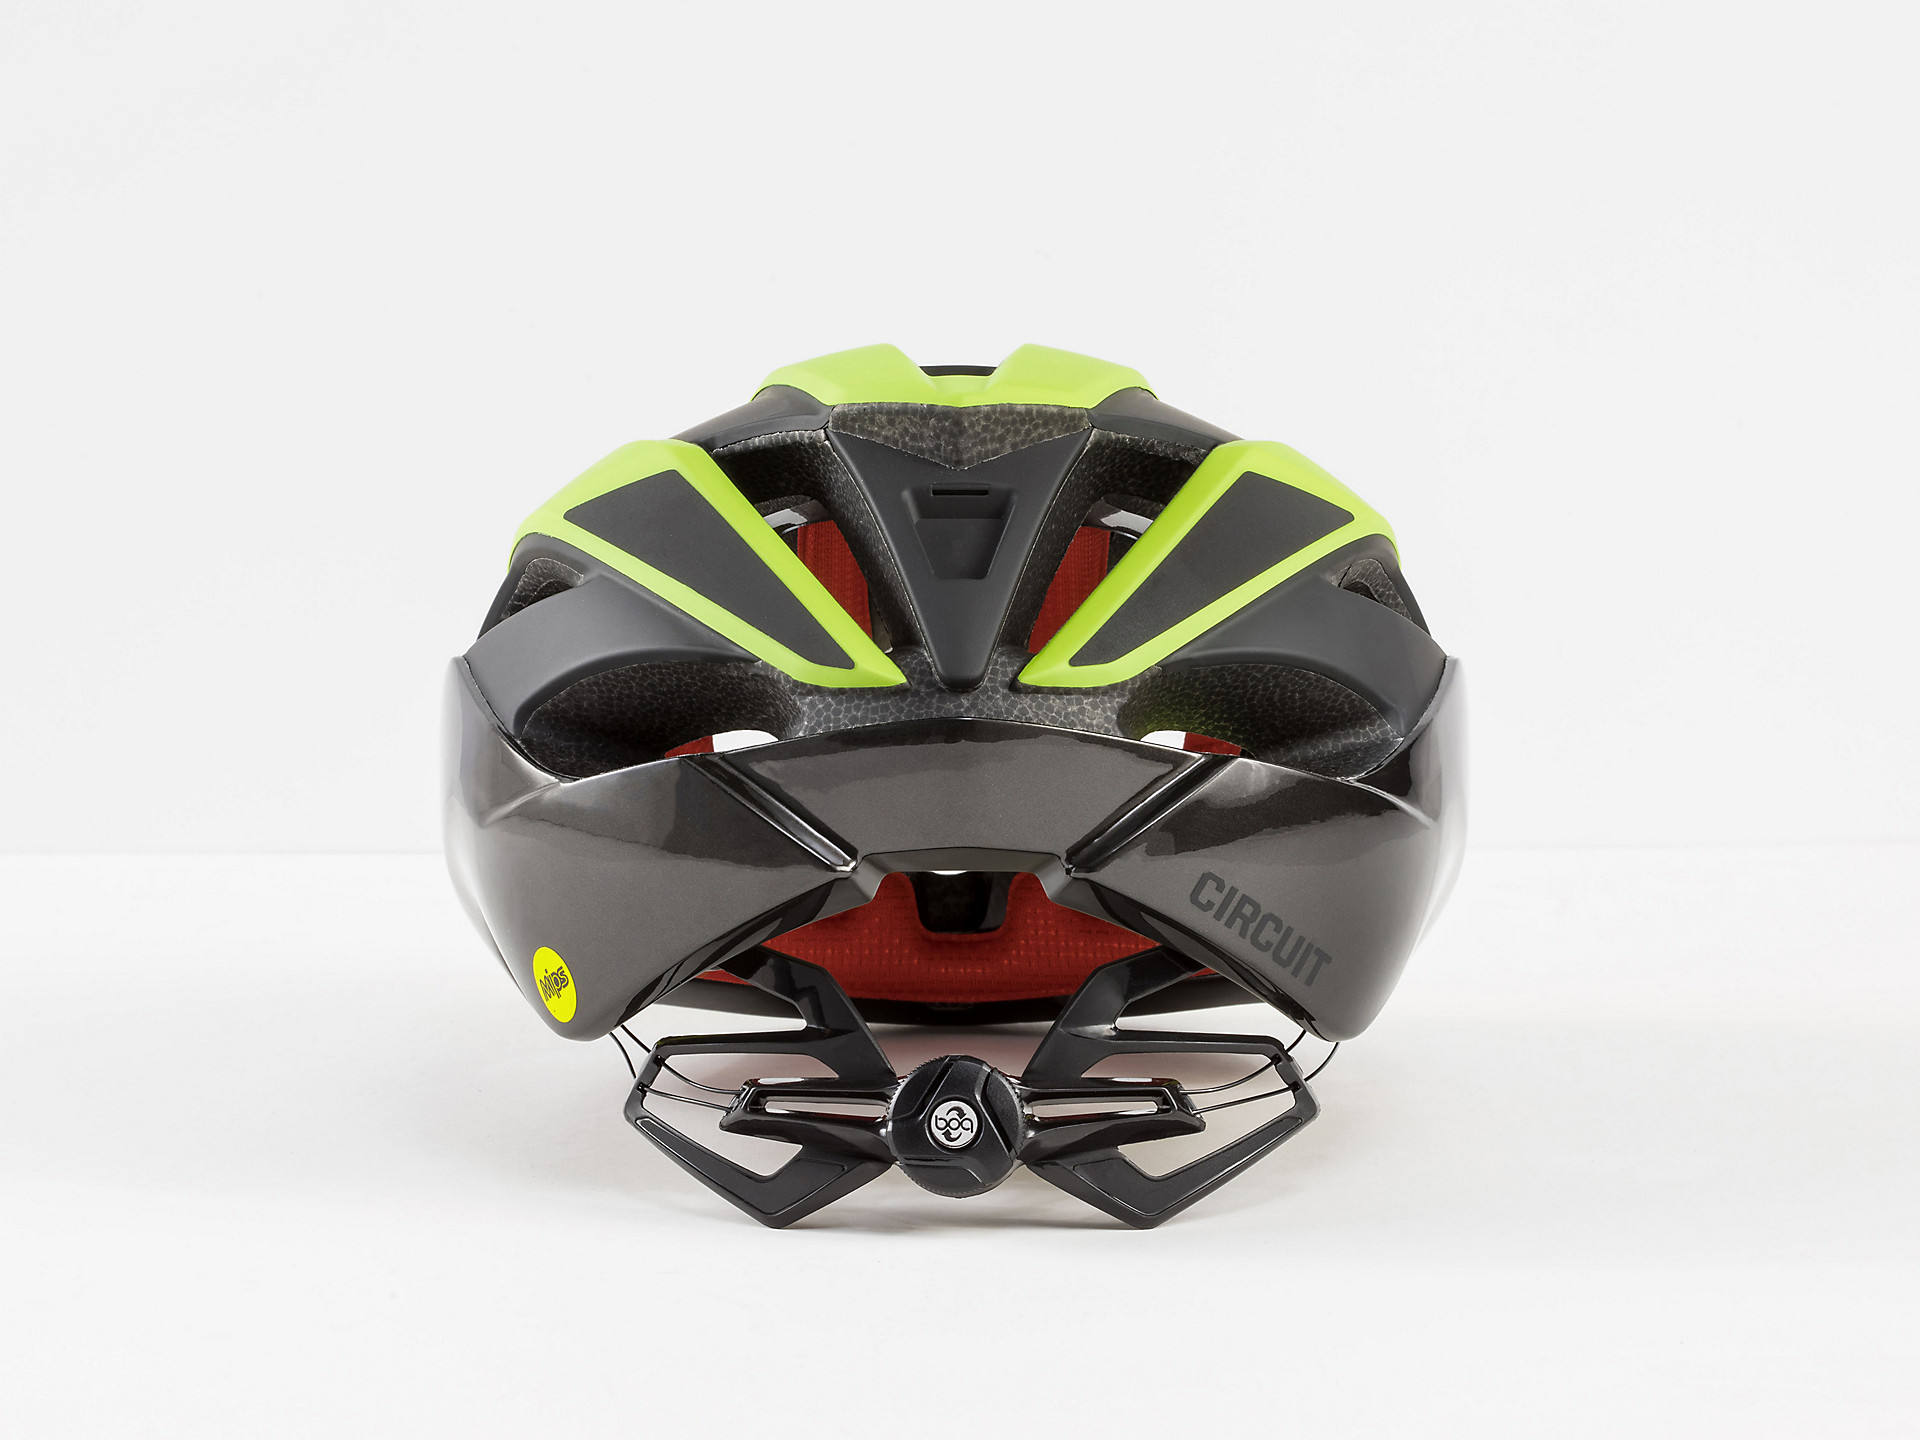 Capacete Bontrager Circuit Mips Amarelo Ciclismo Bike Tam P